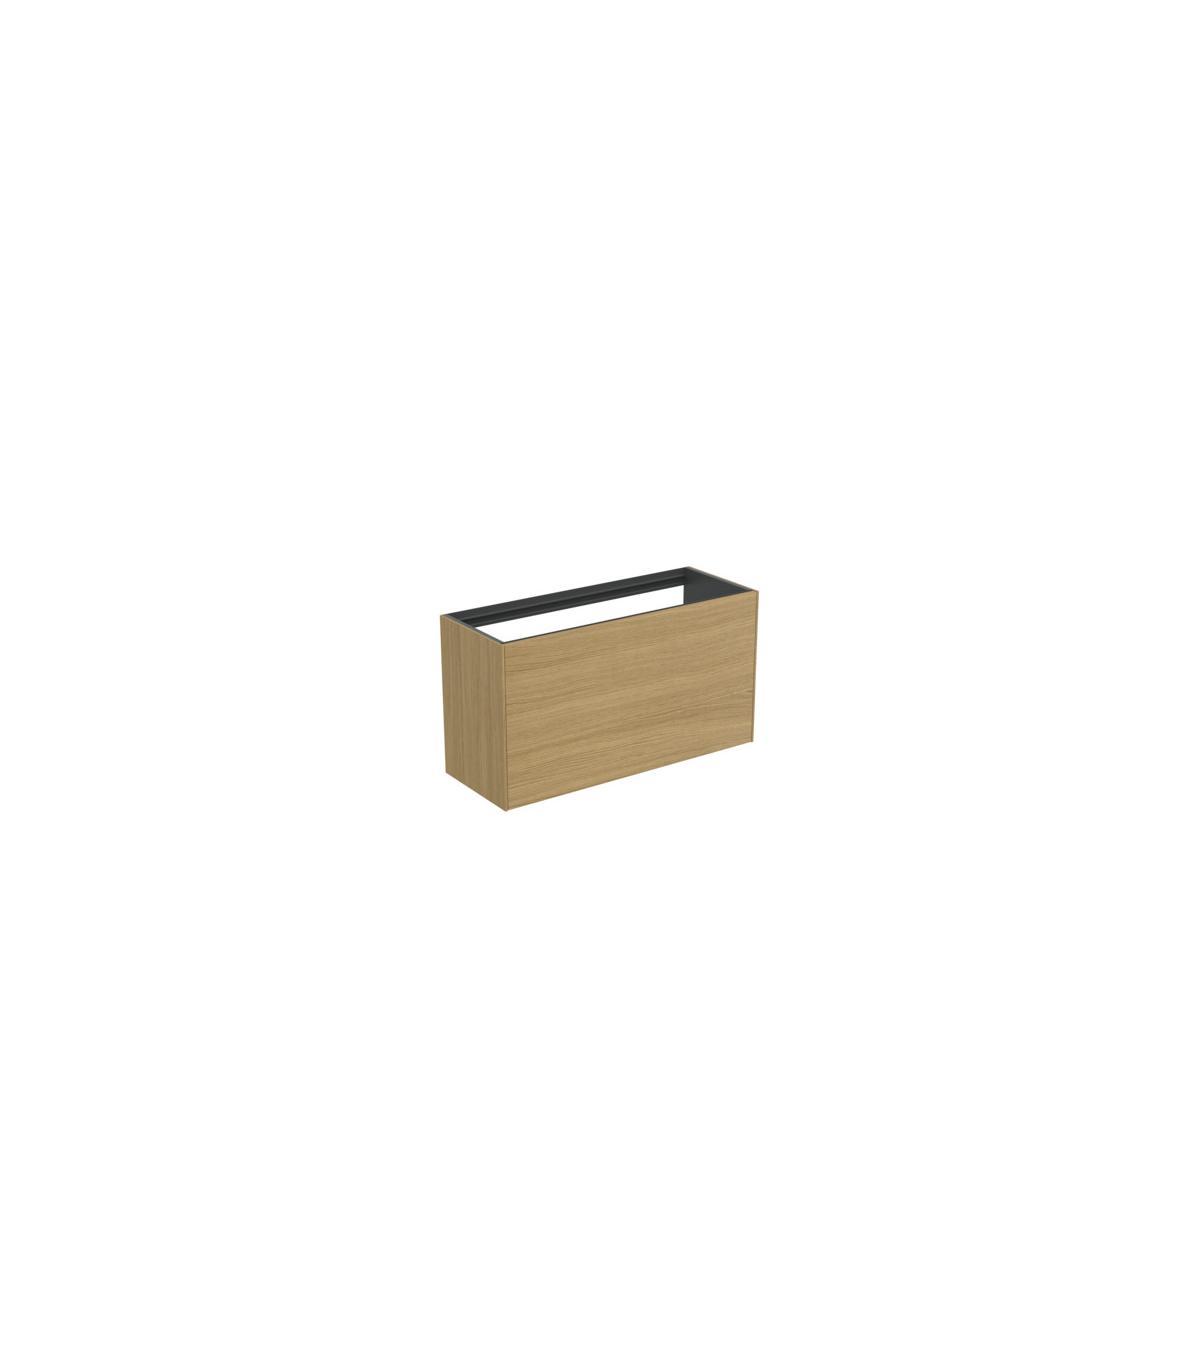 Doccia Vasca Ideal Standard.Miscelatore Vasca Doccia Incasso Ideal Standard Ceraplan Iii Art A6383aa